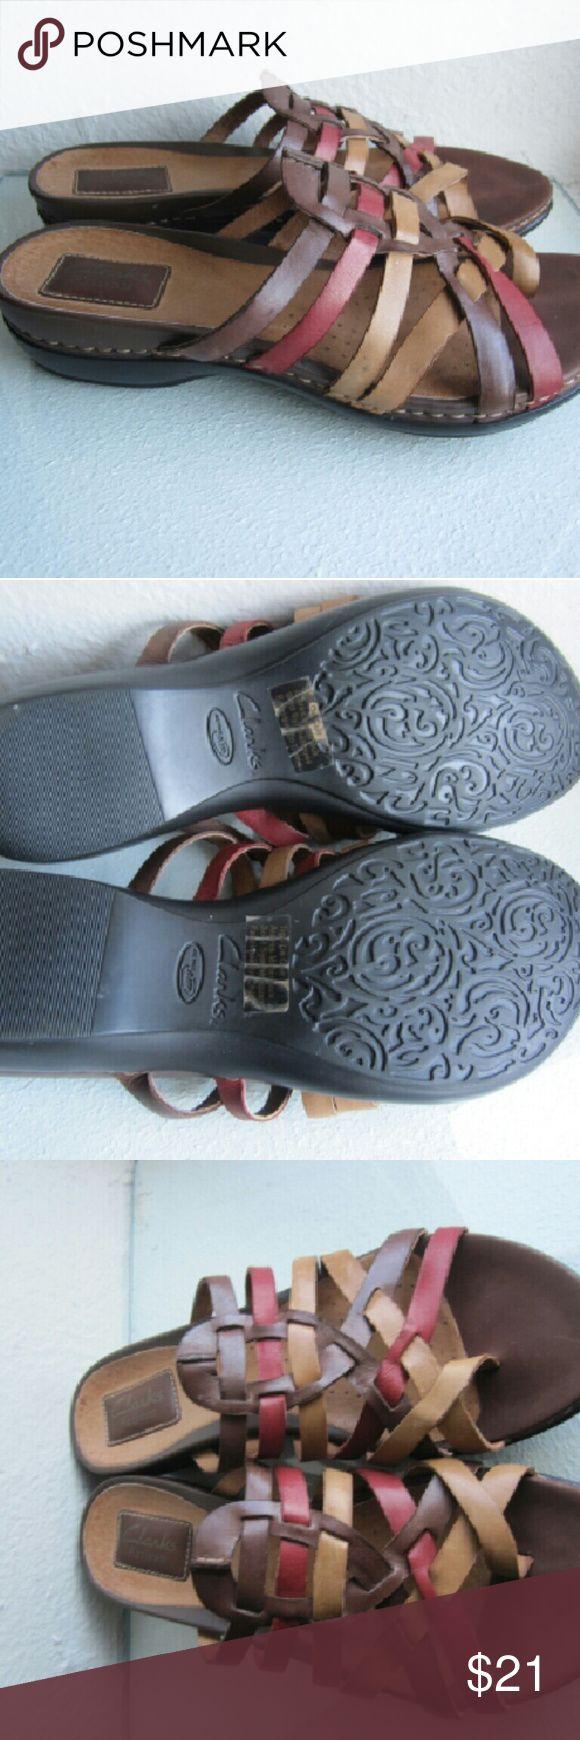 Clark's 9 Artisan slide sandals Multicolored brown leather minimal wear Clarks Shoes Sandals